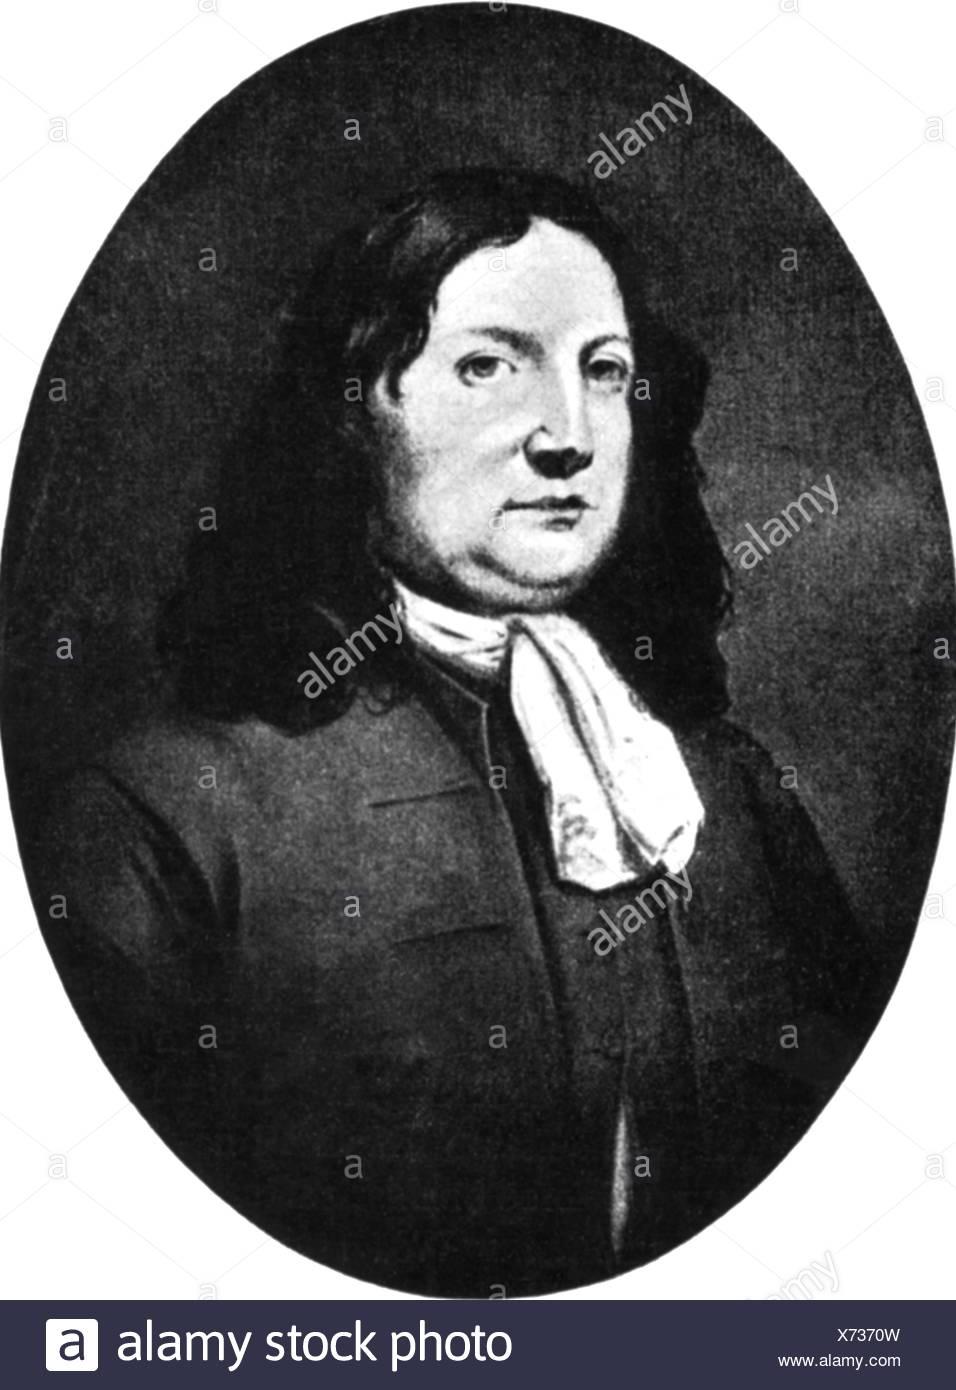 Penn, William, 14.10.1644 - 30.7.1718, English politician, Quaker, founder of Pennsylvania, portrait, oval, Stock Photo